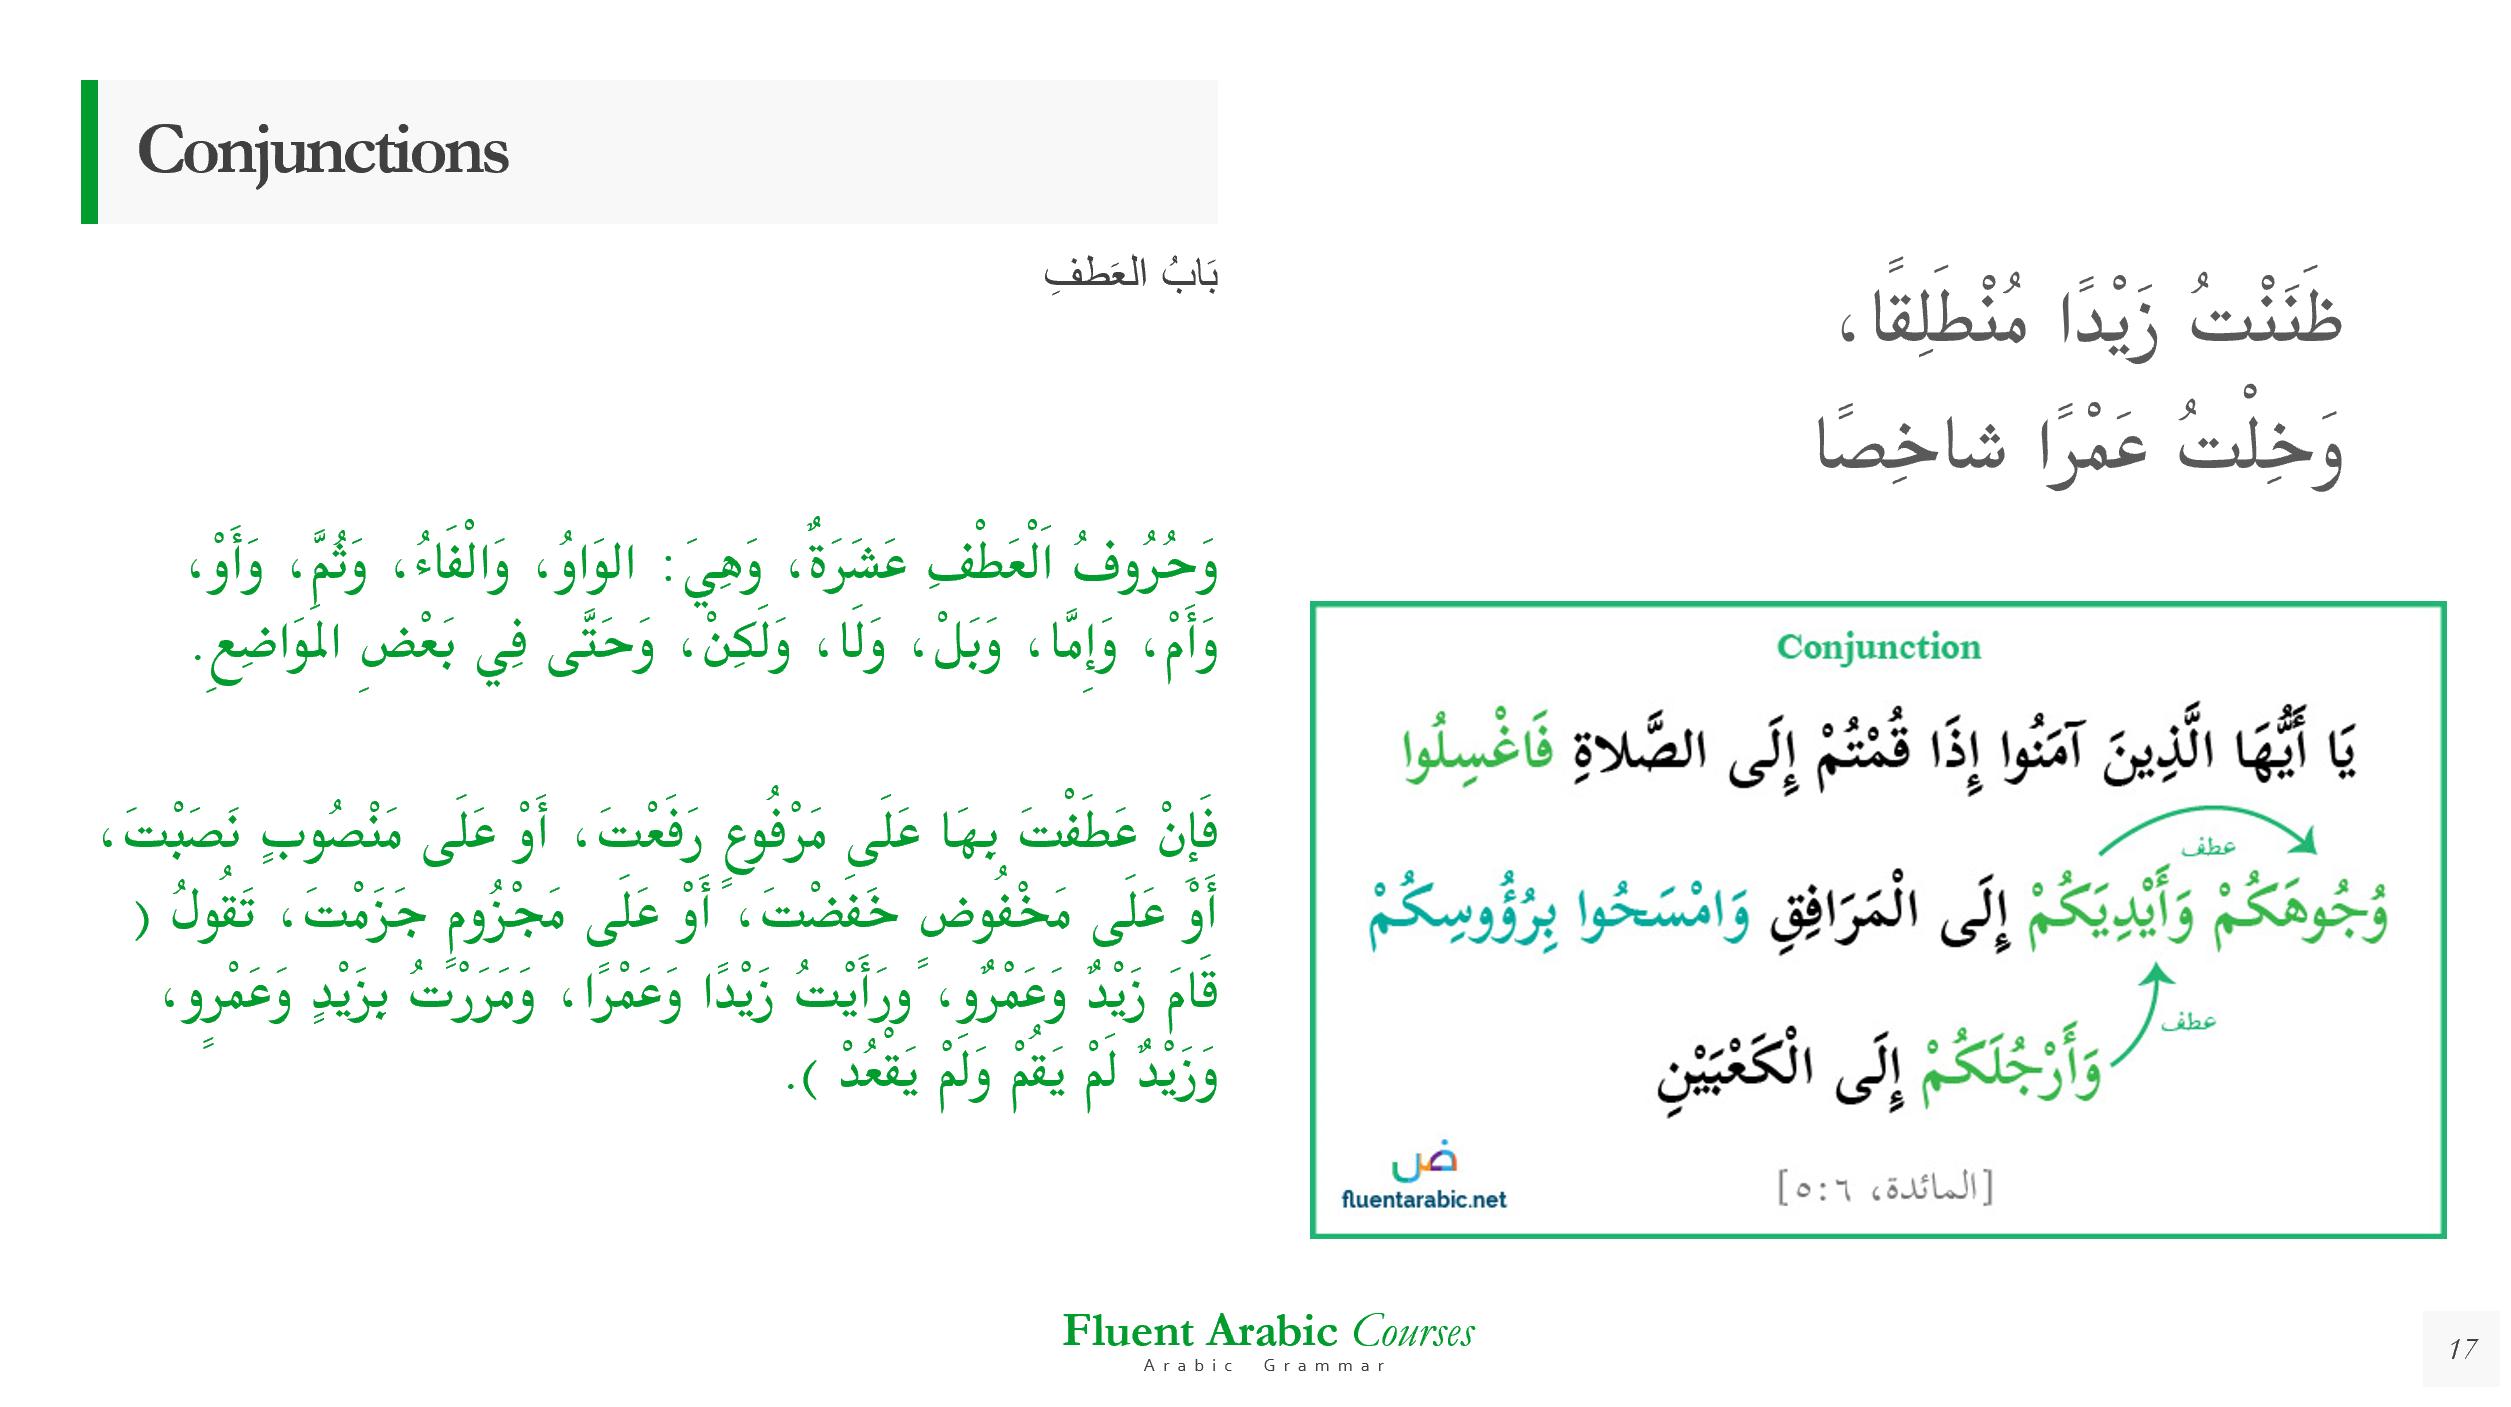 arabic grammar for beginners through the jr m yyah fluent arabic. Black Bedroom Furniture Sets. Home Design Ideas